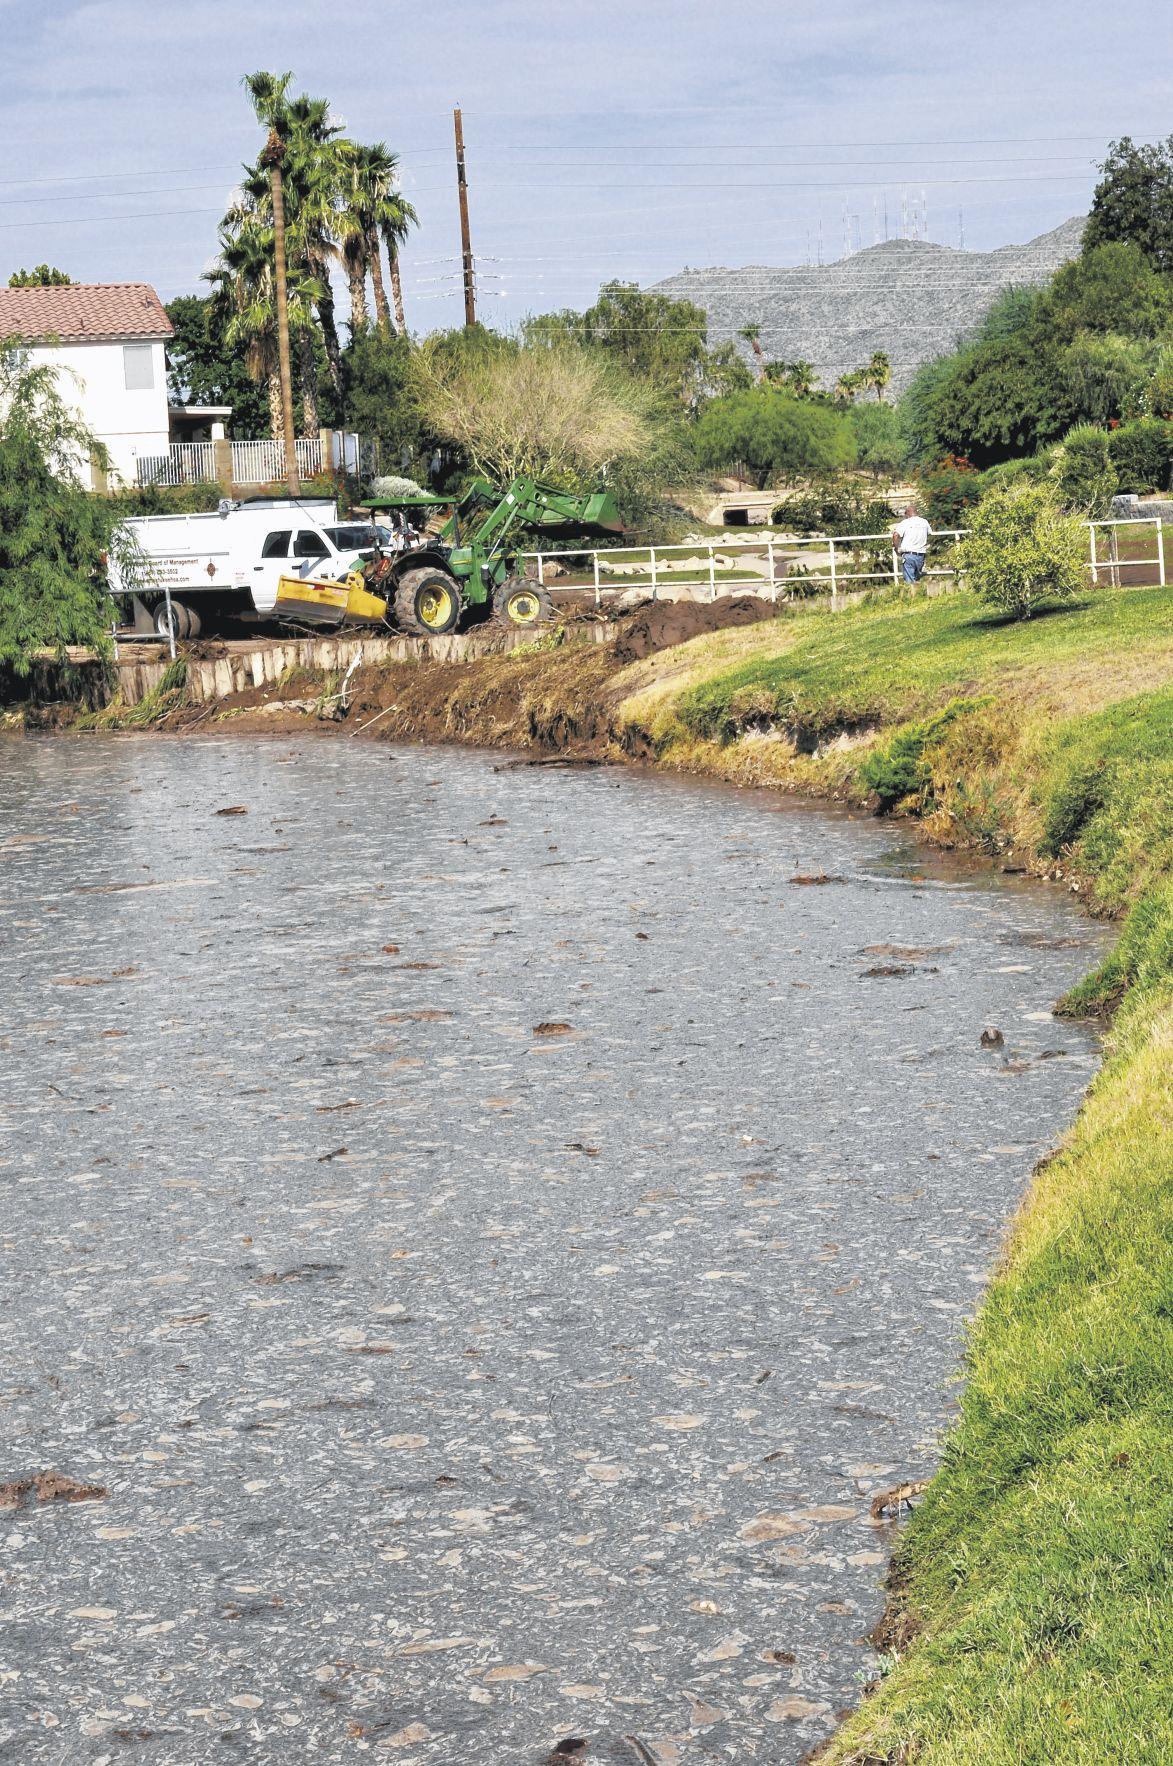 Downpour floods Ahwatukee streets exacerbates conditions